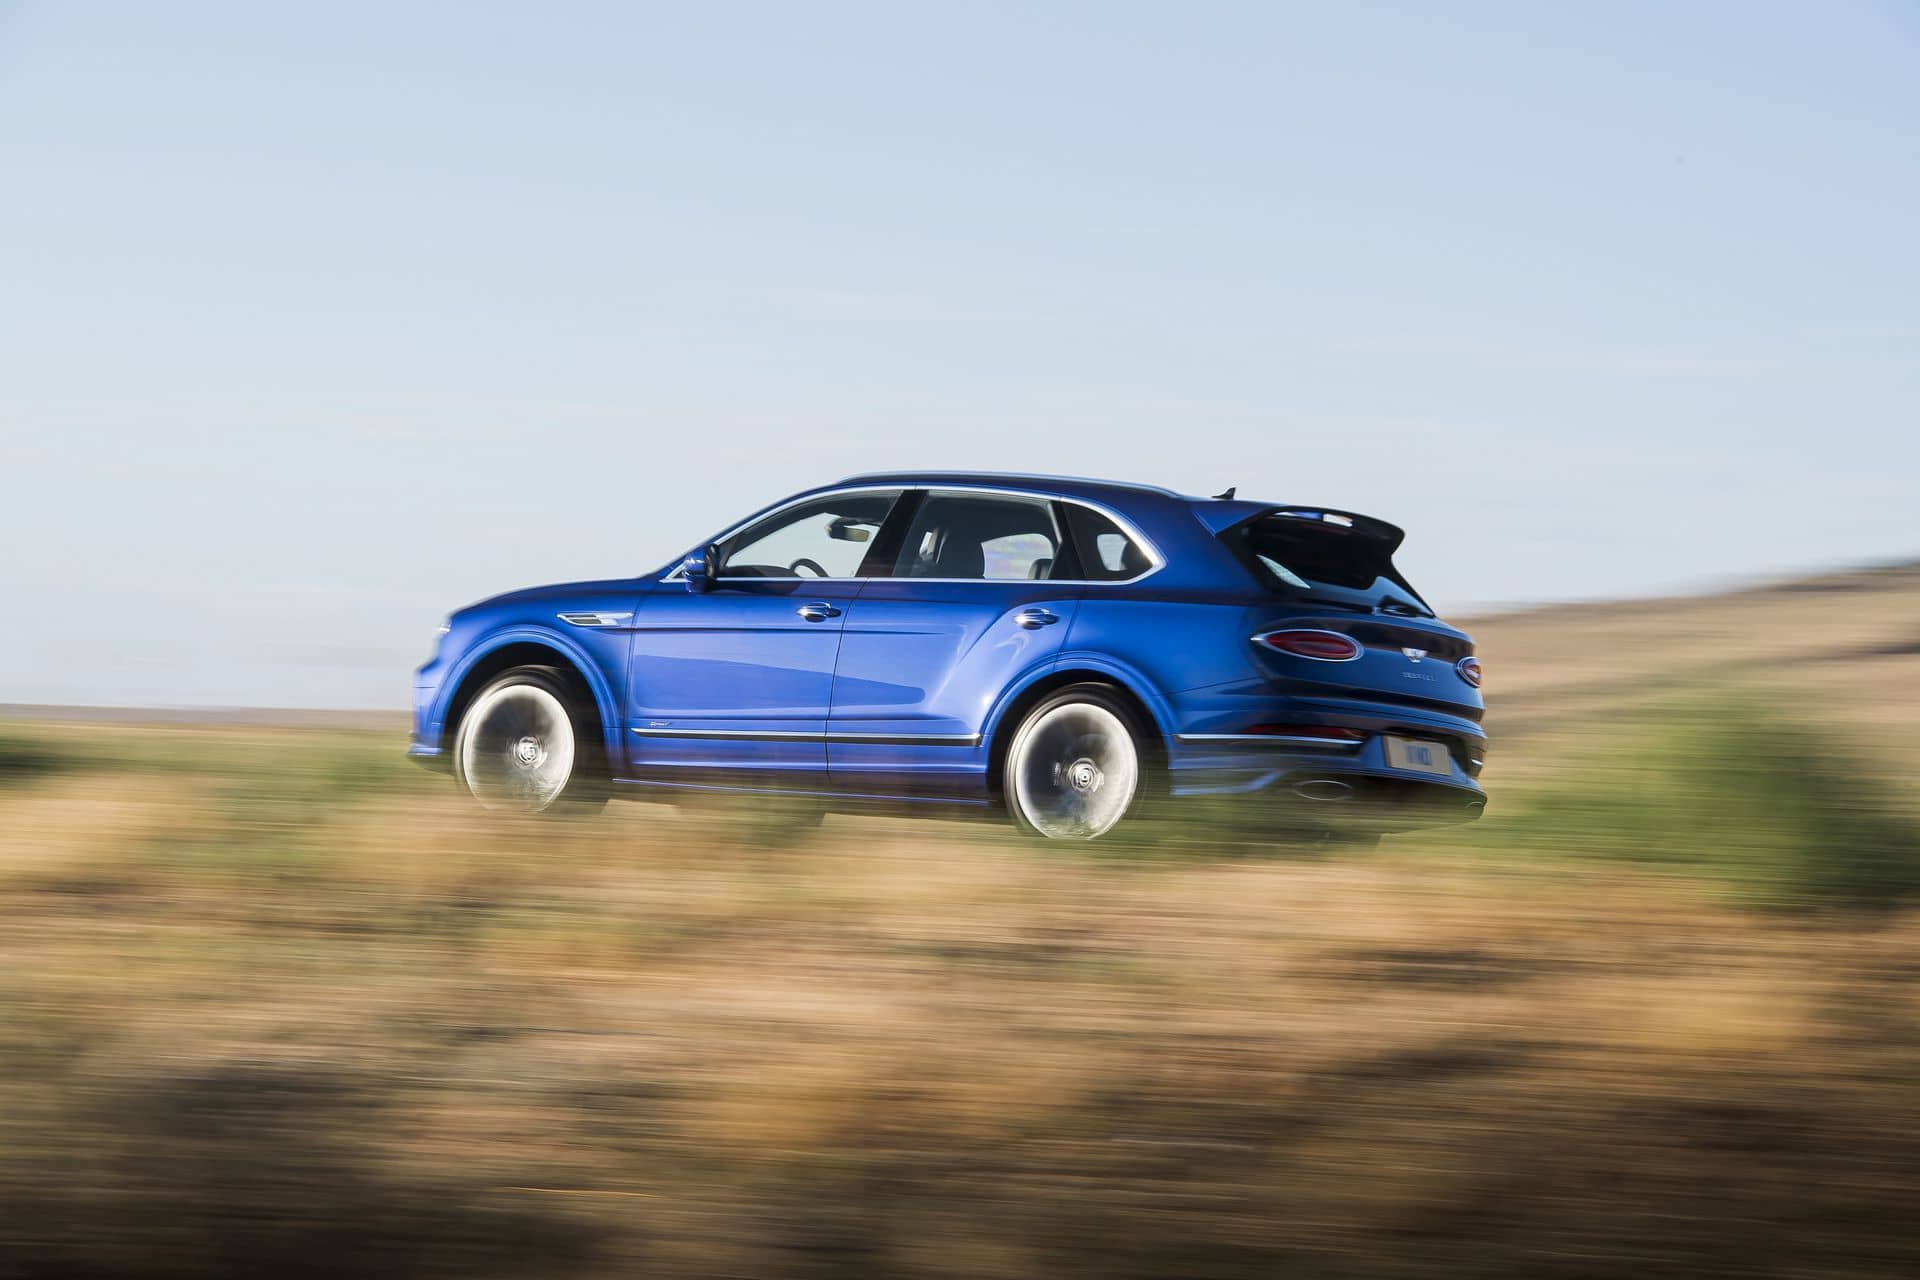 Bentley Bentayga Speed W12 (2021) - lifting